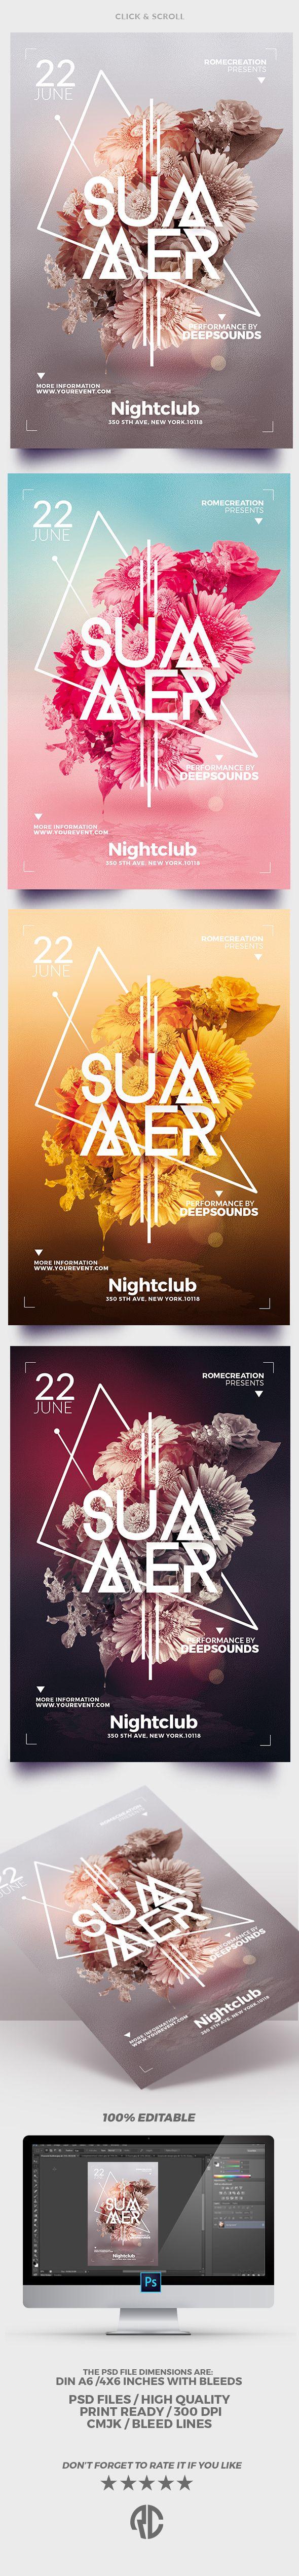 Poster design ideas - Minimalist Summer Flyer Templates 4 Versions Creative Design Very Easy To Edit